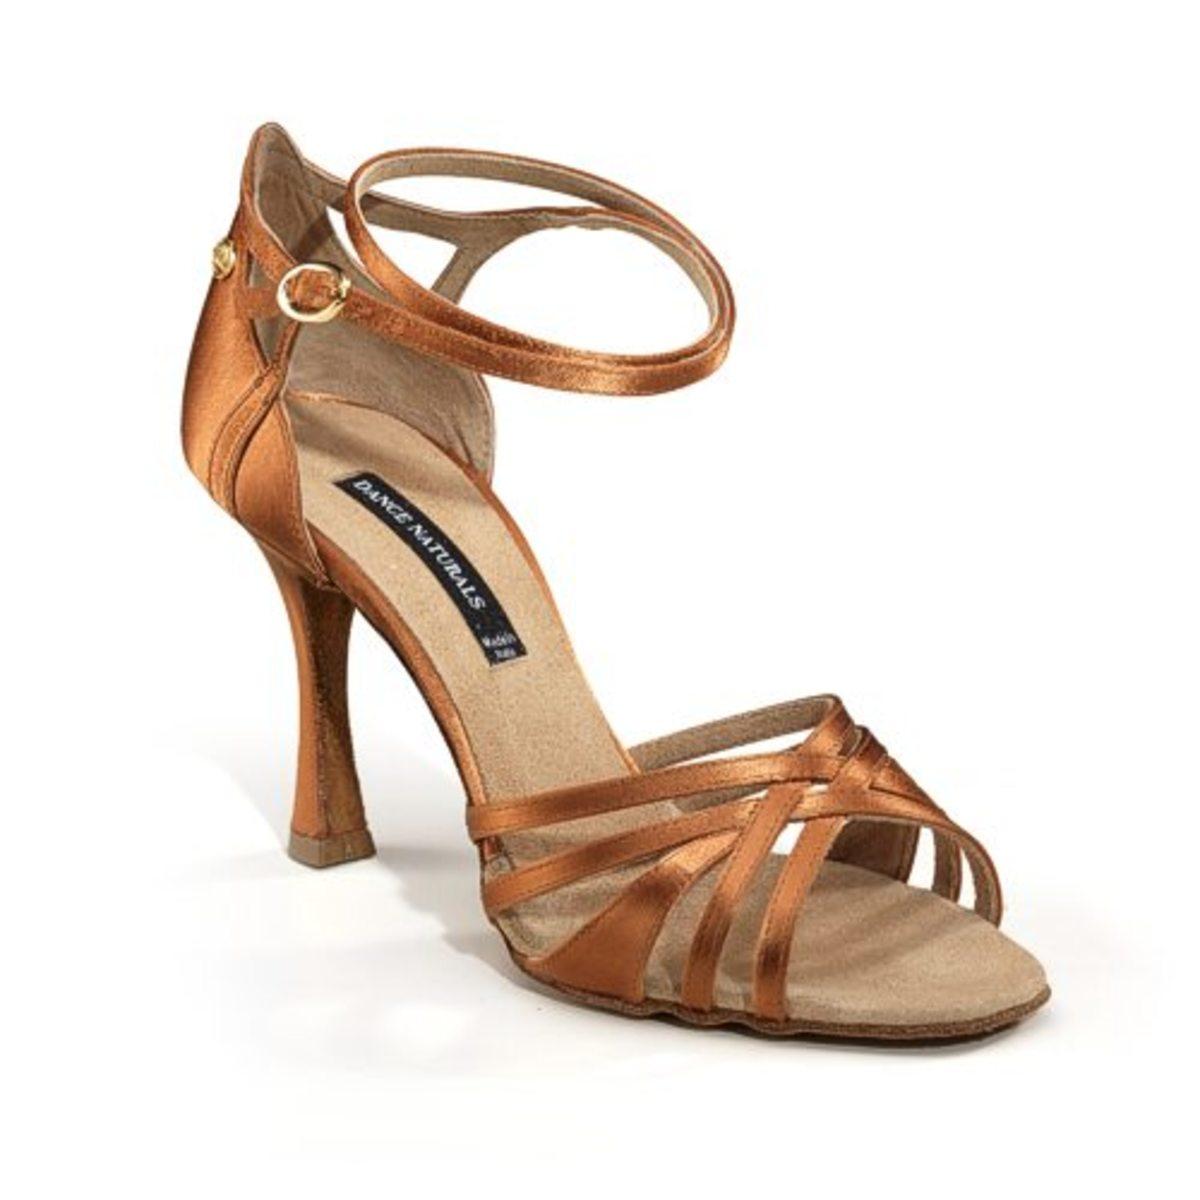 Typical satin beige women's Latin dance shoe